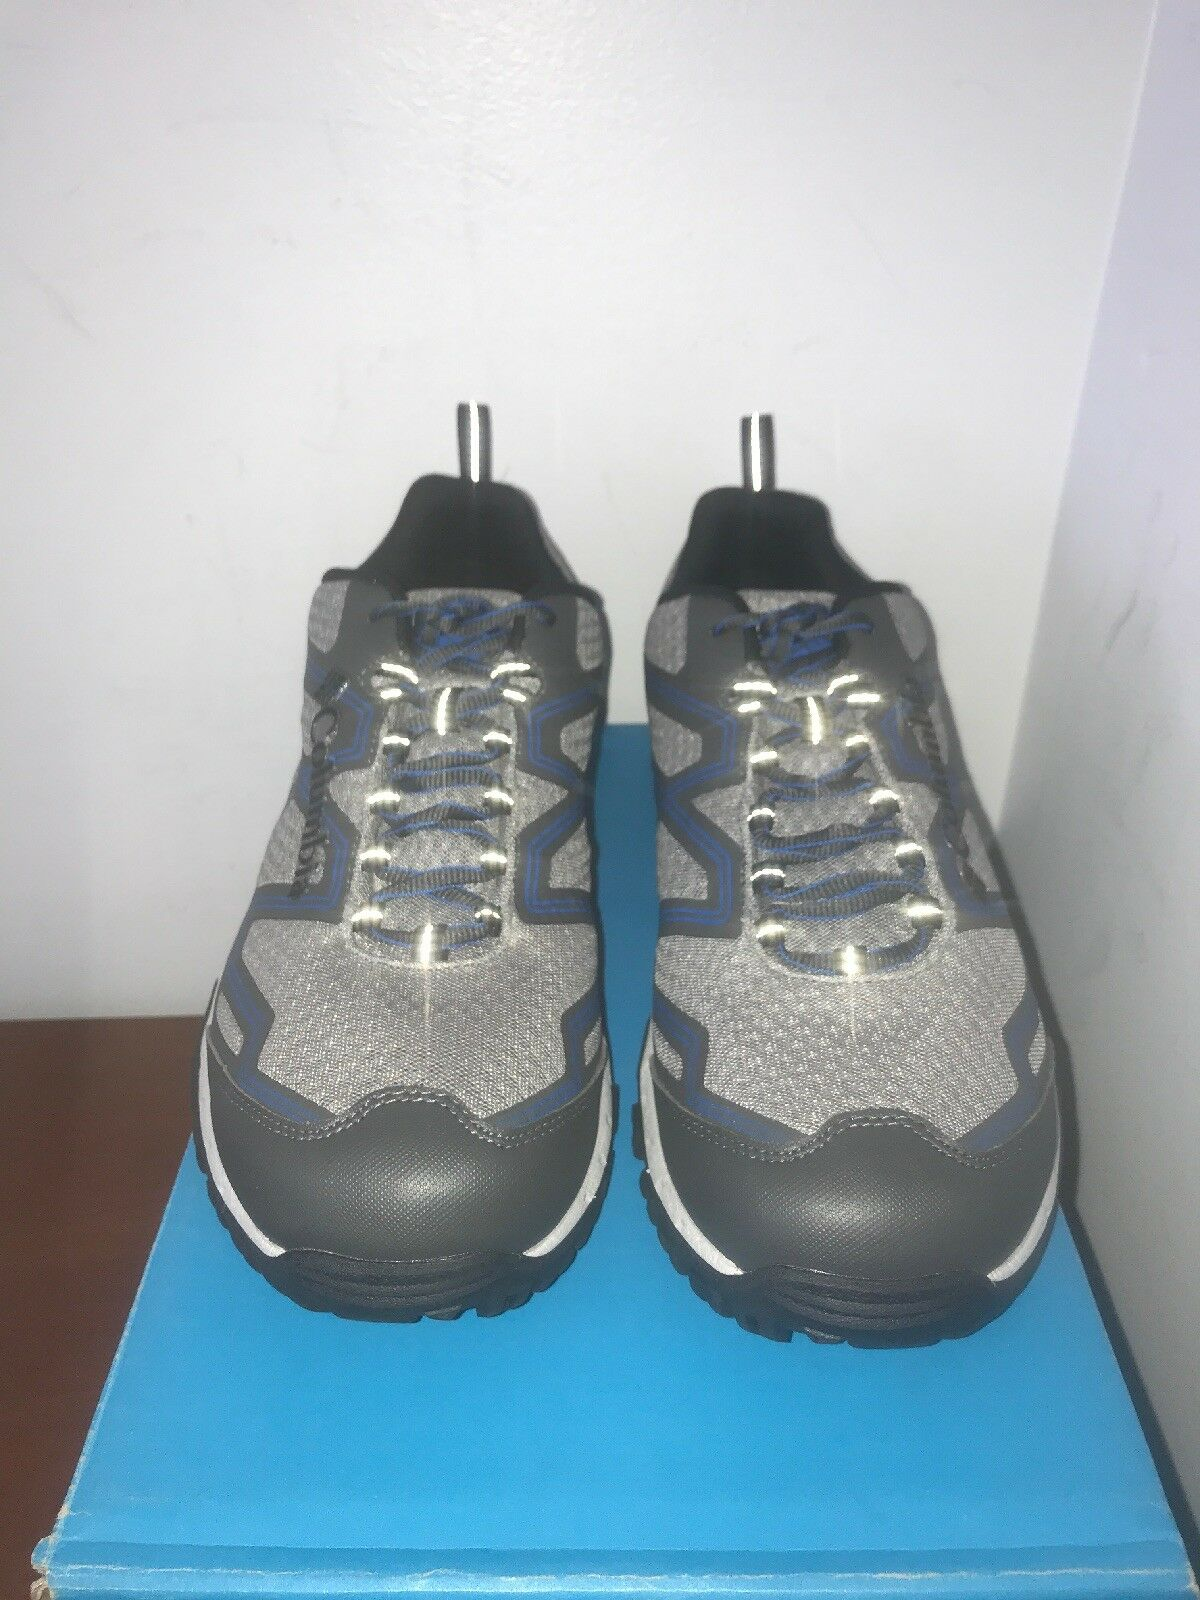 NIB COLUMBIA PINE blueFFS OMNI-TECH MEN'S WATERPROOF TRAIL HIKING SHOES - size 12